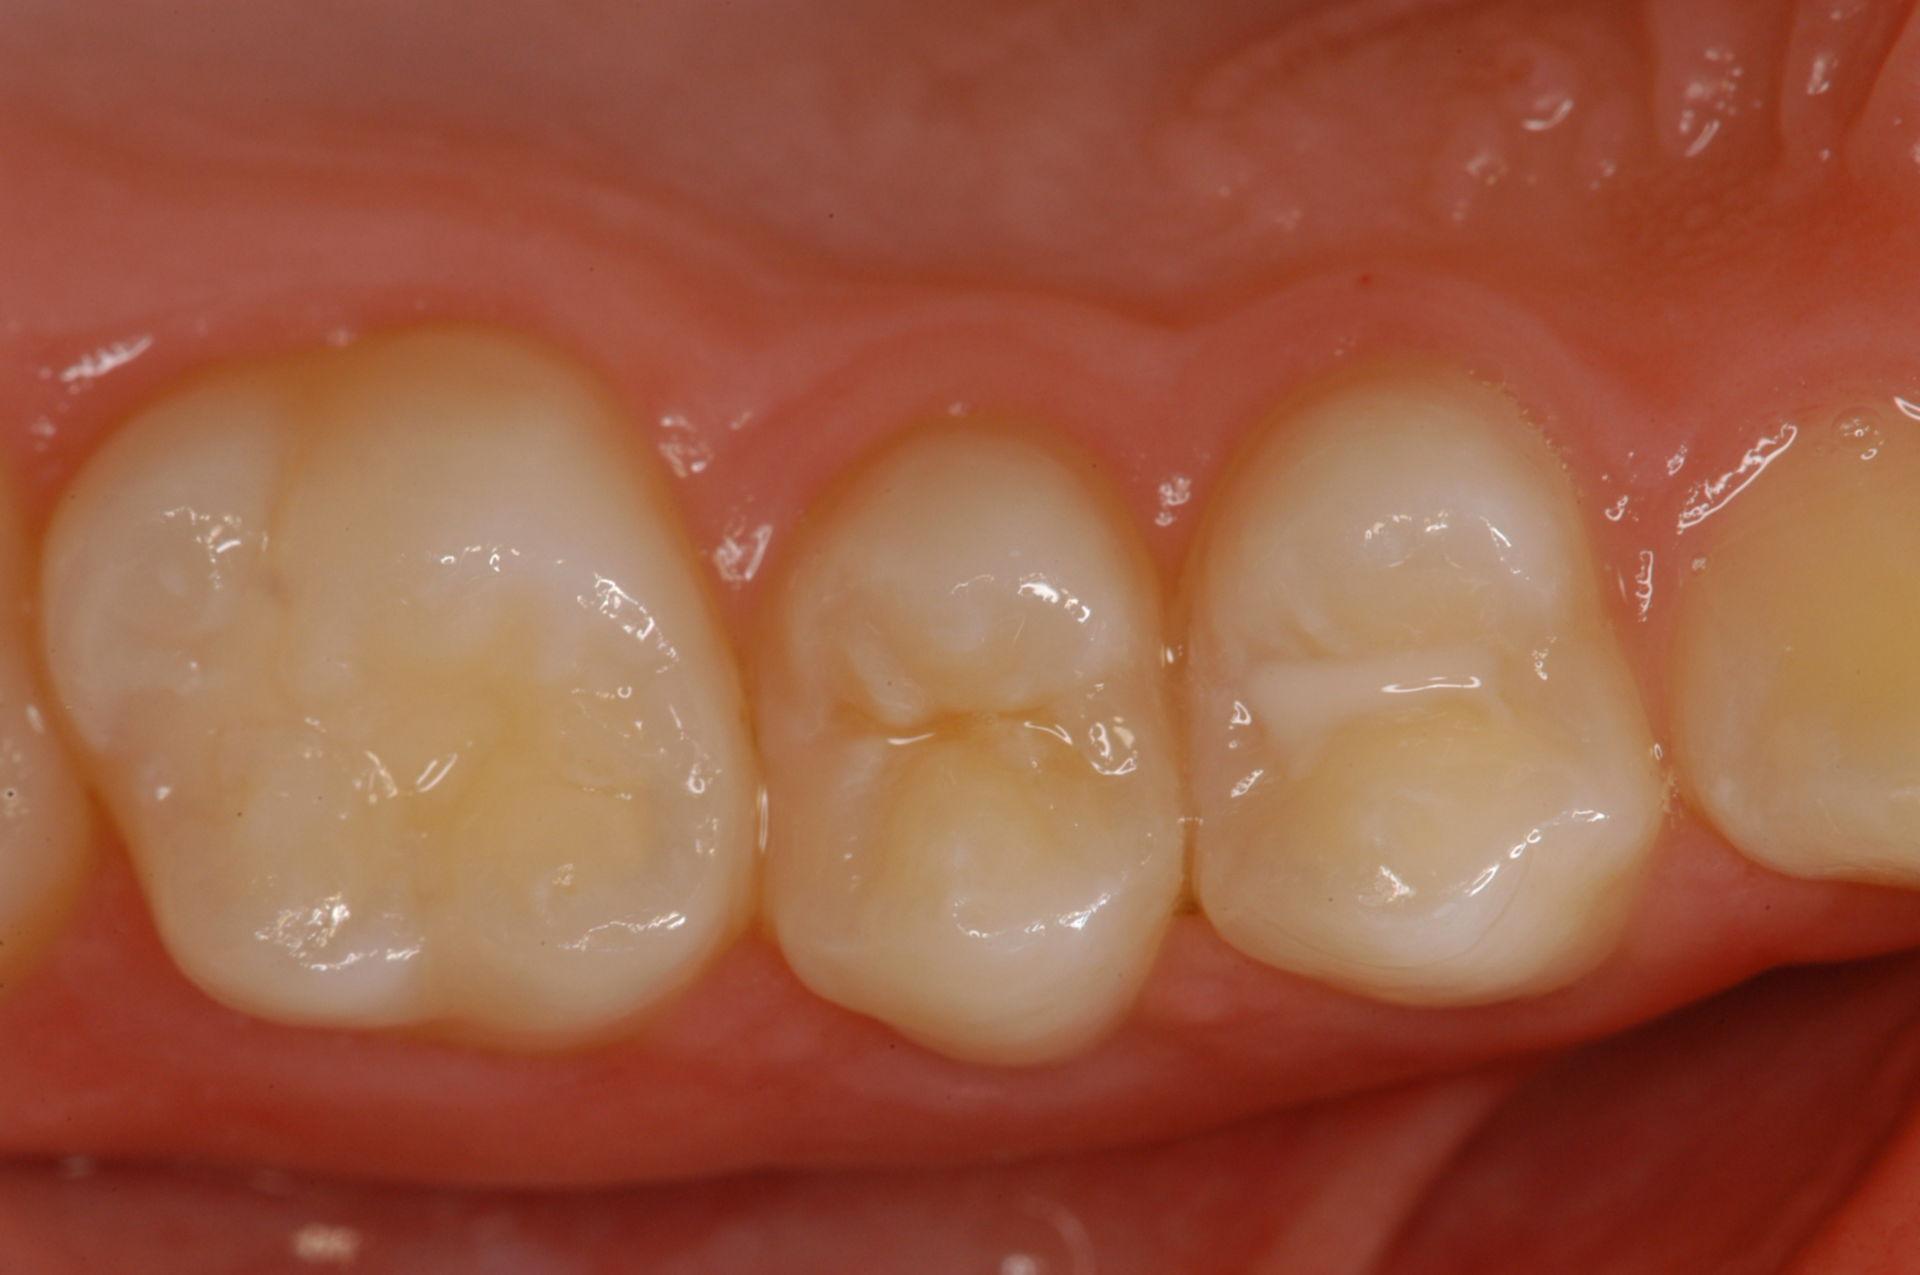 Caries-free teeth maxillary premolar and first molar